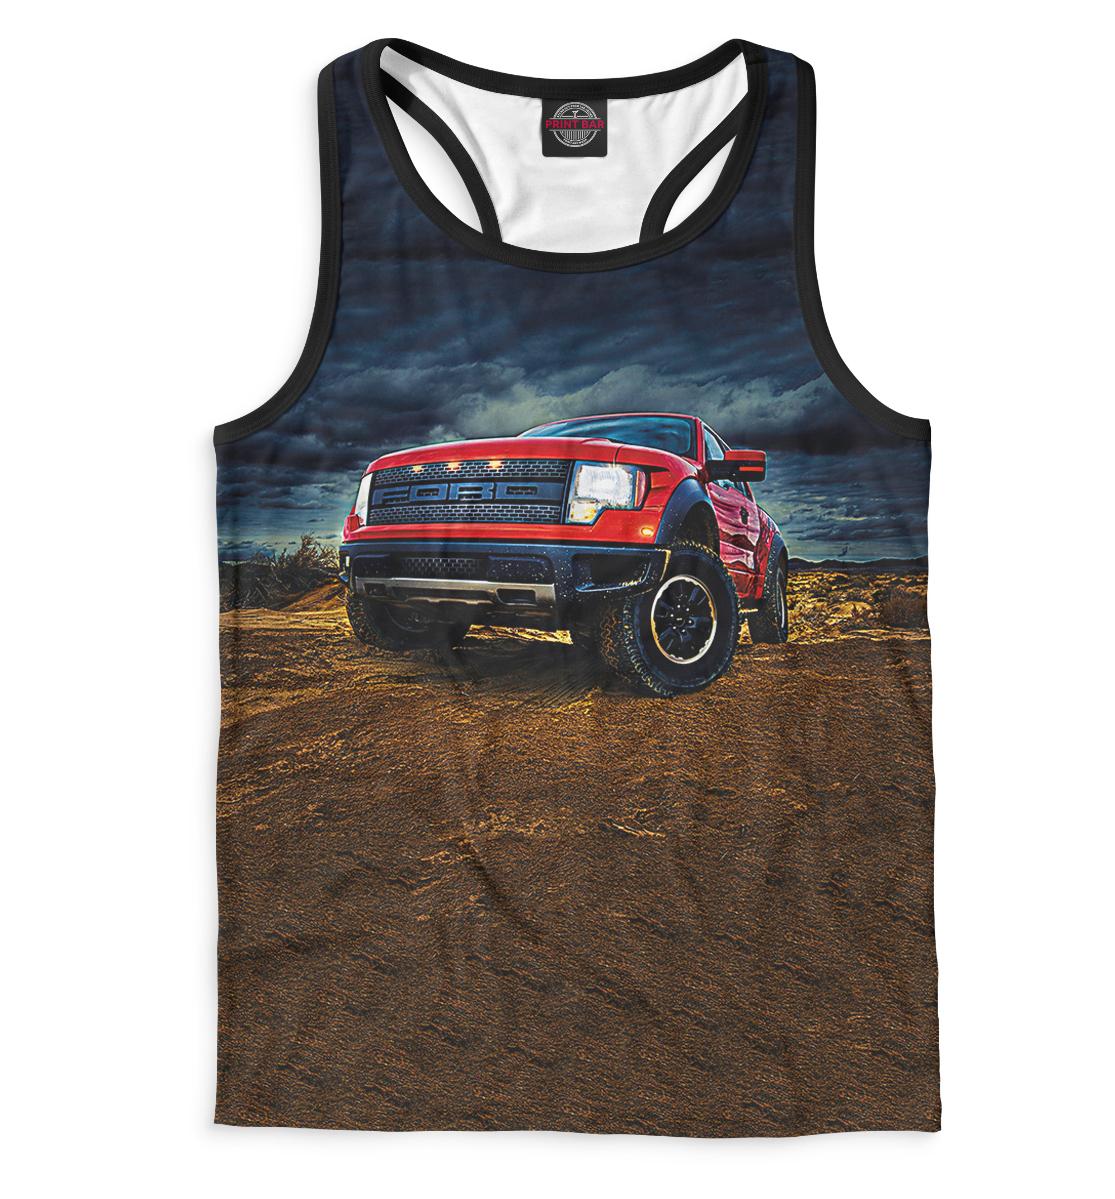 Купить Ford F-150 Raptor, Printbar, Майки борцовки, OUT-339408-mayb-2